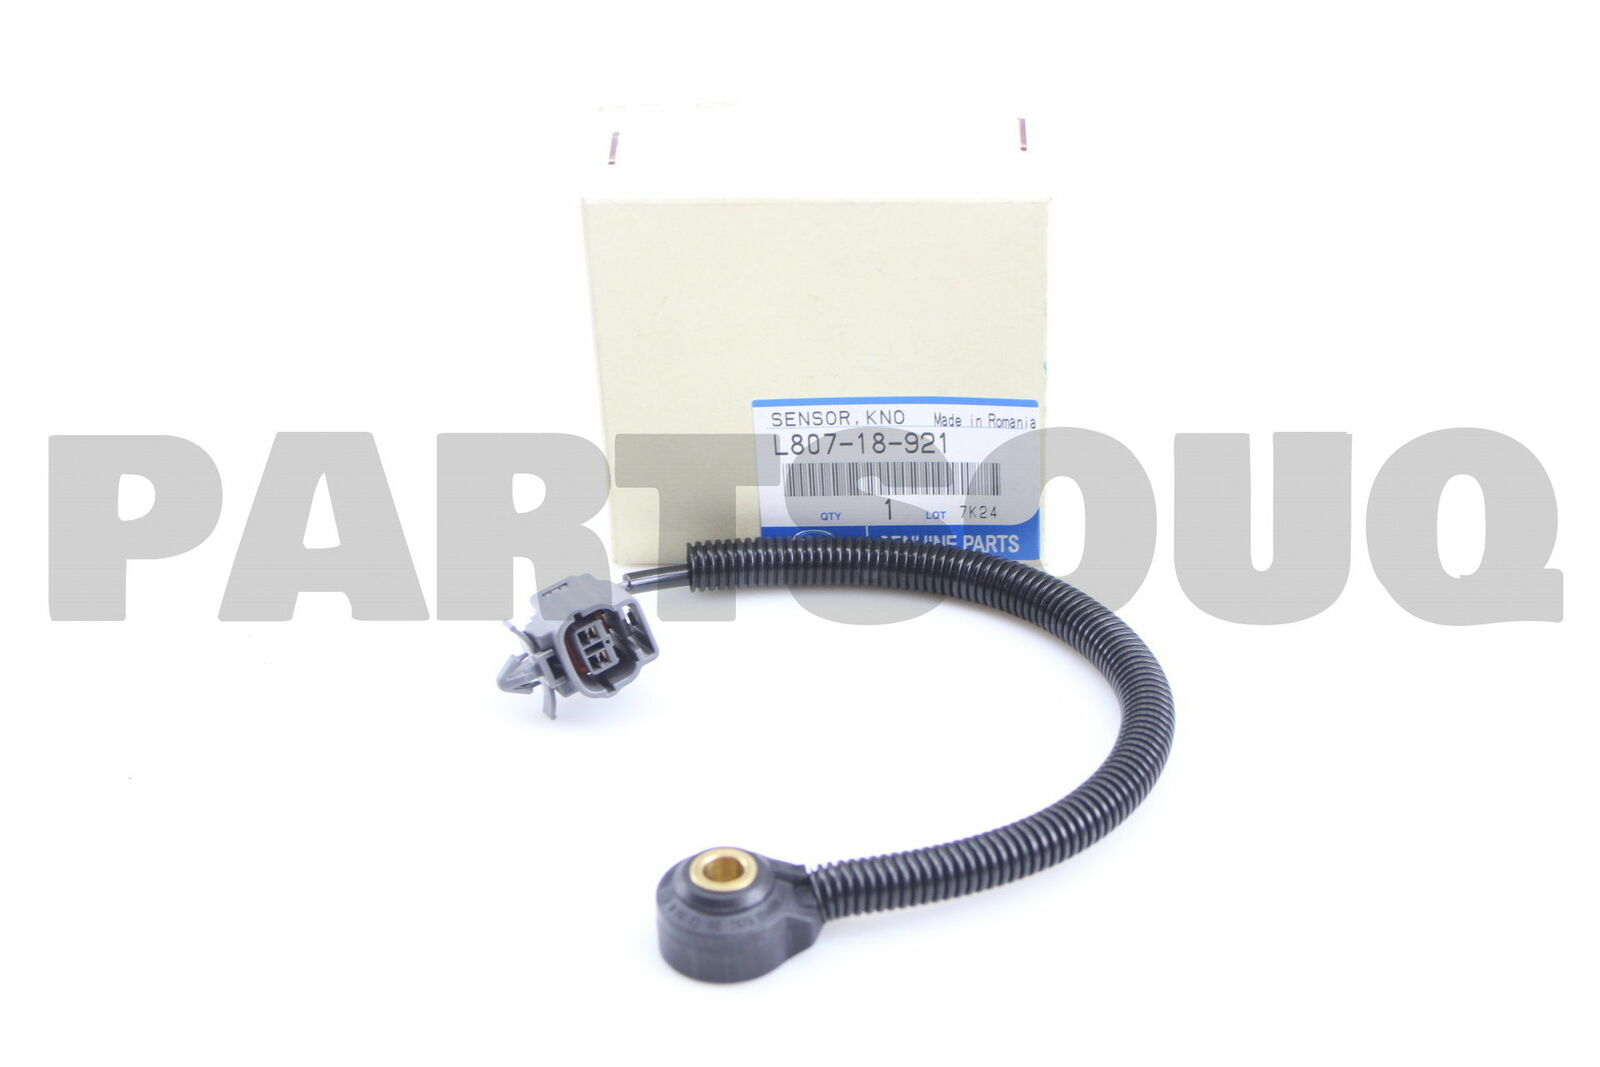 Sensor Mazda L807-18-921 Ignition Knock Detonation